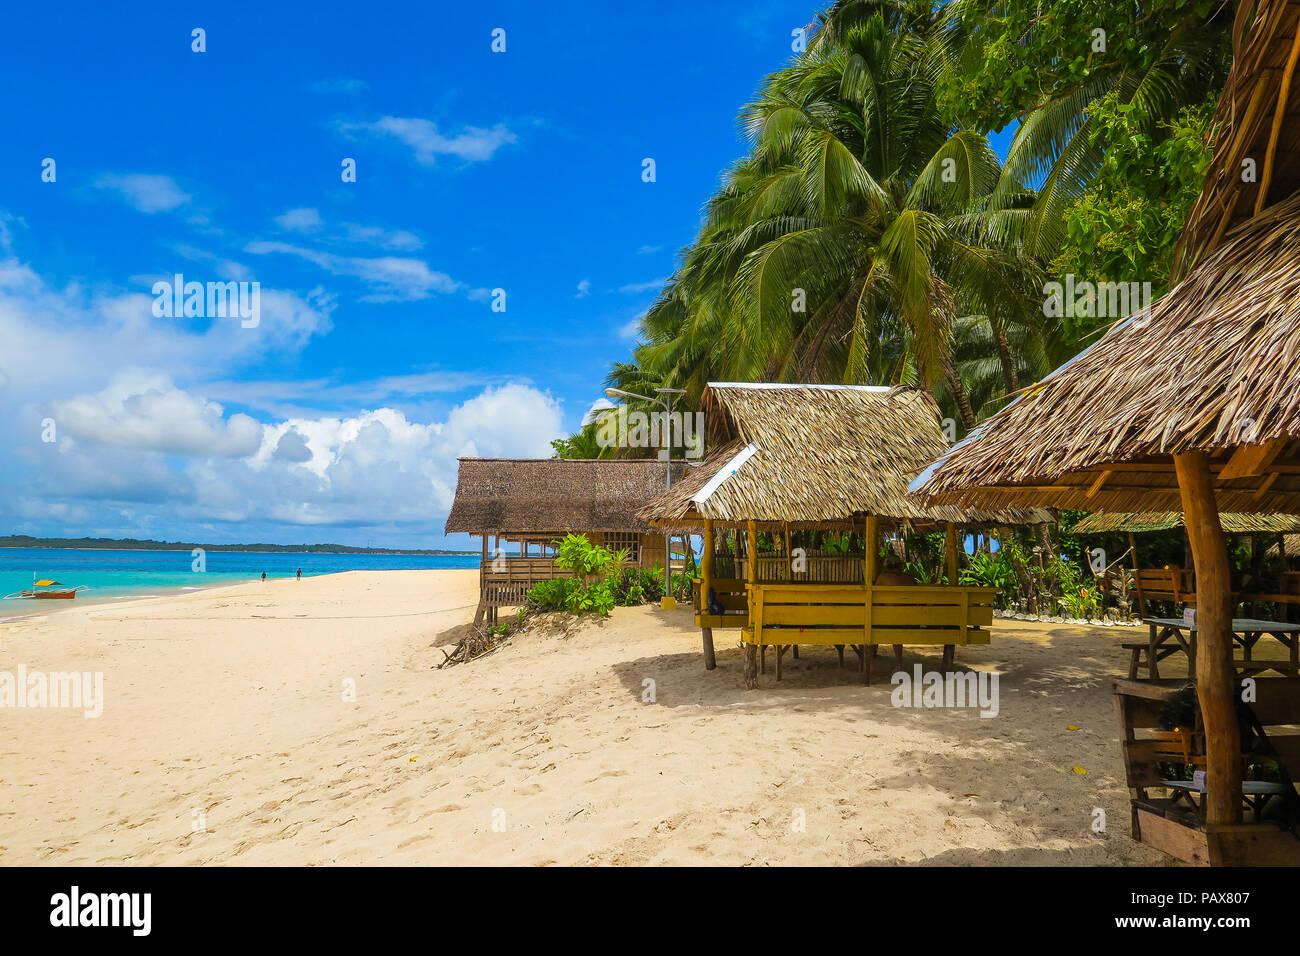 Tropical Island Beach Hut: Nipa Stock Photos & Nipa Stock Images